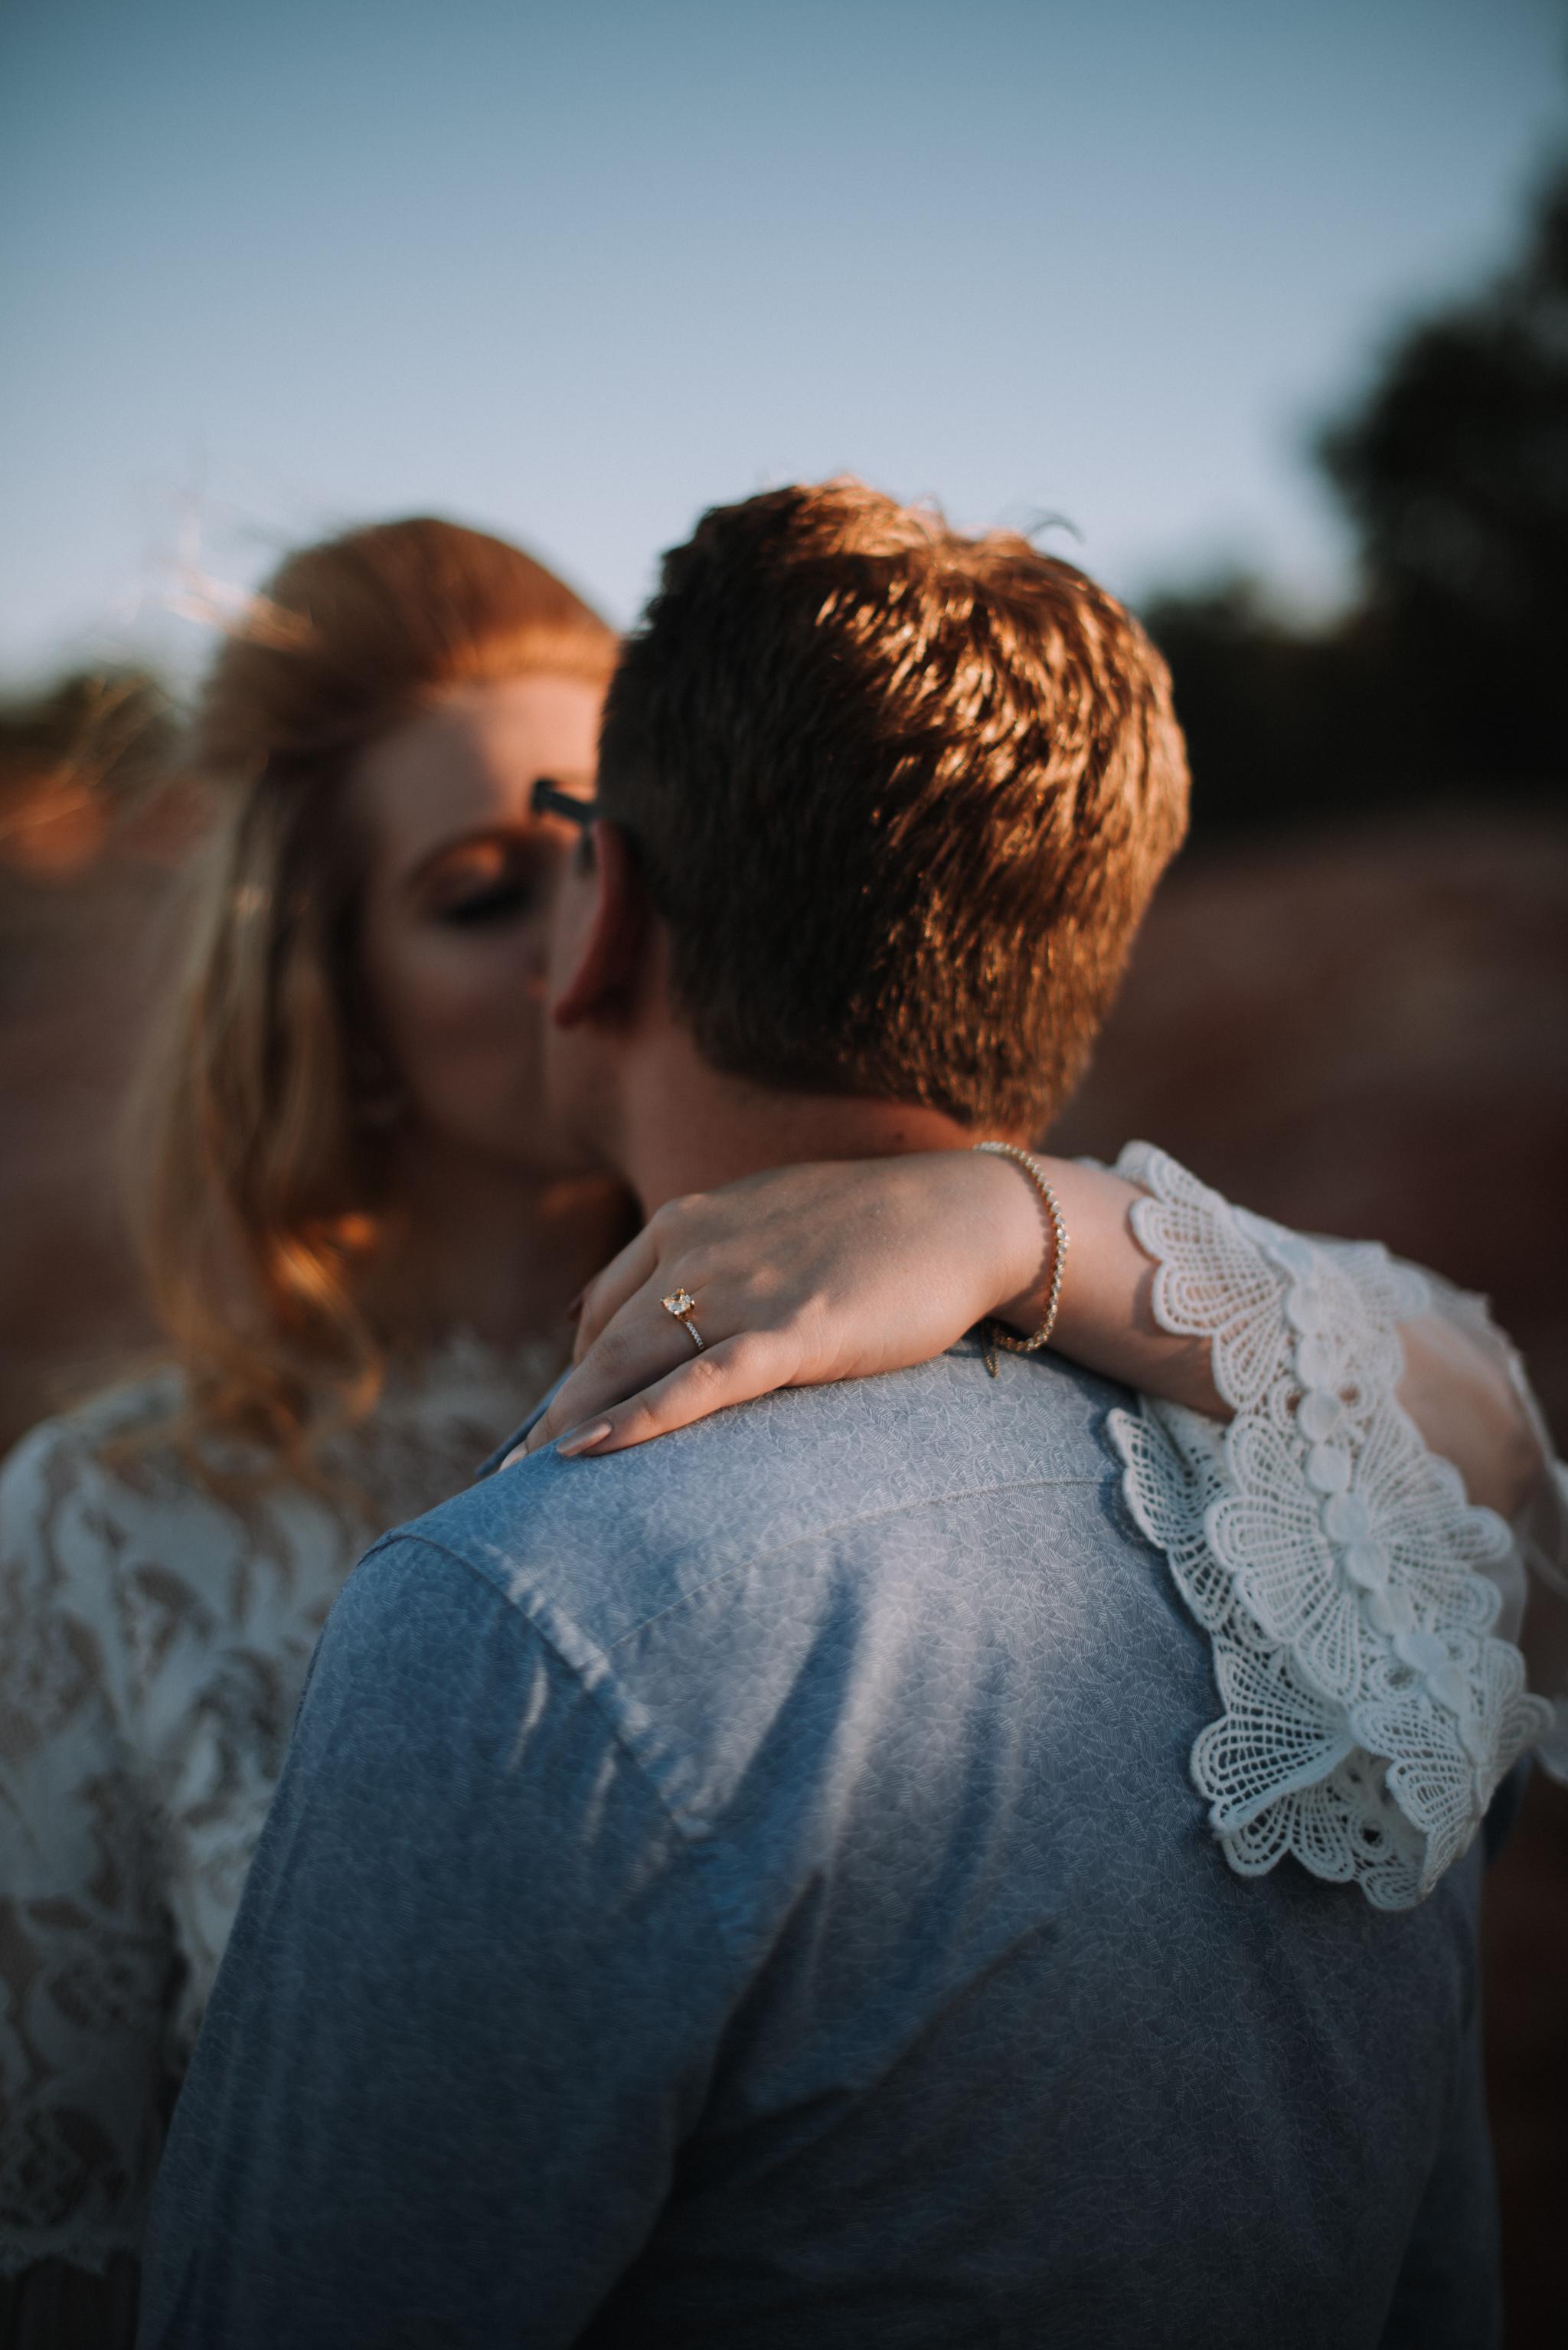 LOVELENSCAPES PHOTOGRAPHY • VISUAL POETRY • MELBOURNE WEDDING PHOTOGRAPHER • ALANNAH HILL DRESS • SUNSET ENGAGEMENT PHOTOS • PINK CLIFFS HEATHCOTE • FASHION EDITORIAL PHOTOGRAPHER • 9.jpg